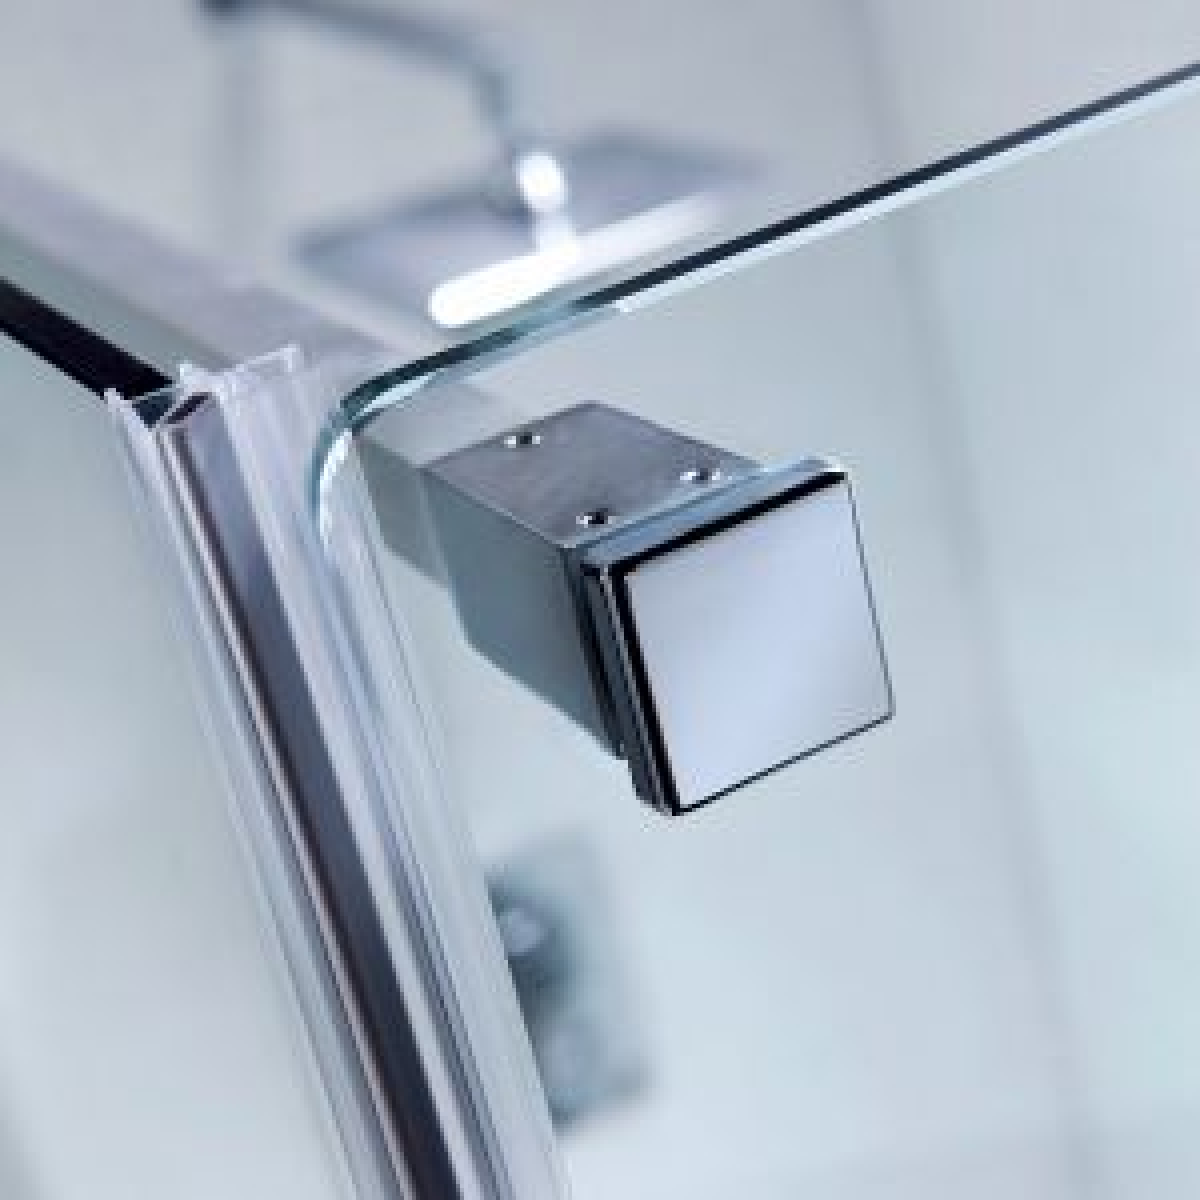 Prestige2 Frameless Hinged Shower Door with Optional Side Panel Detail 4